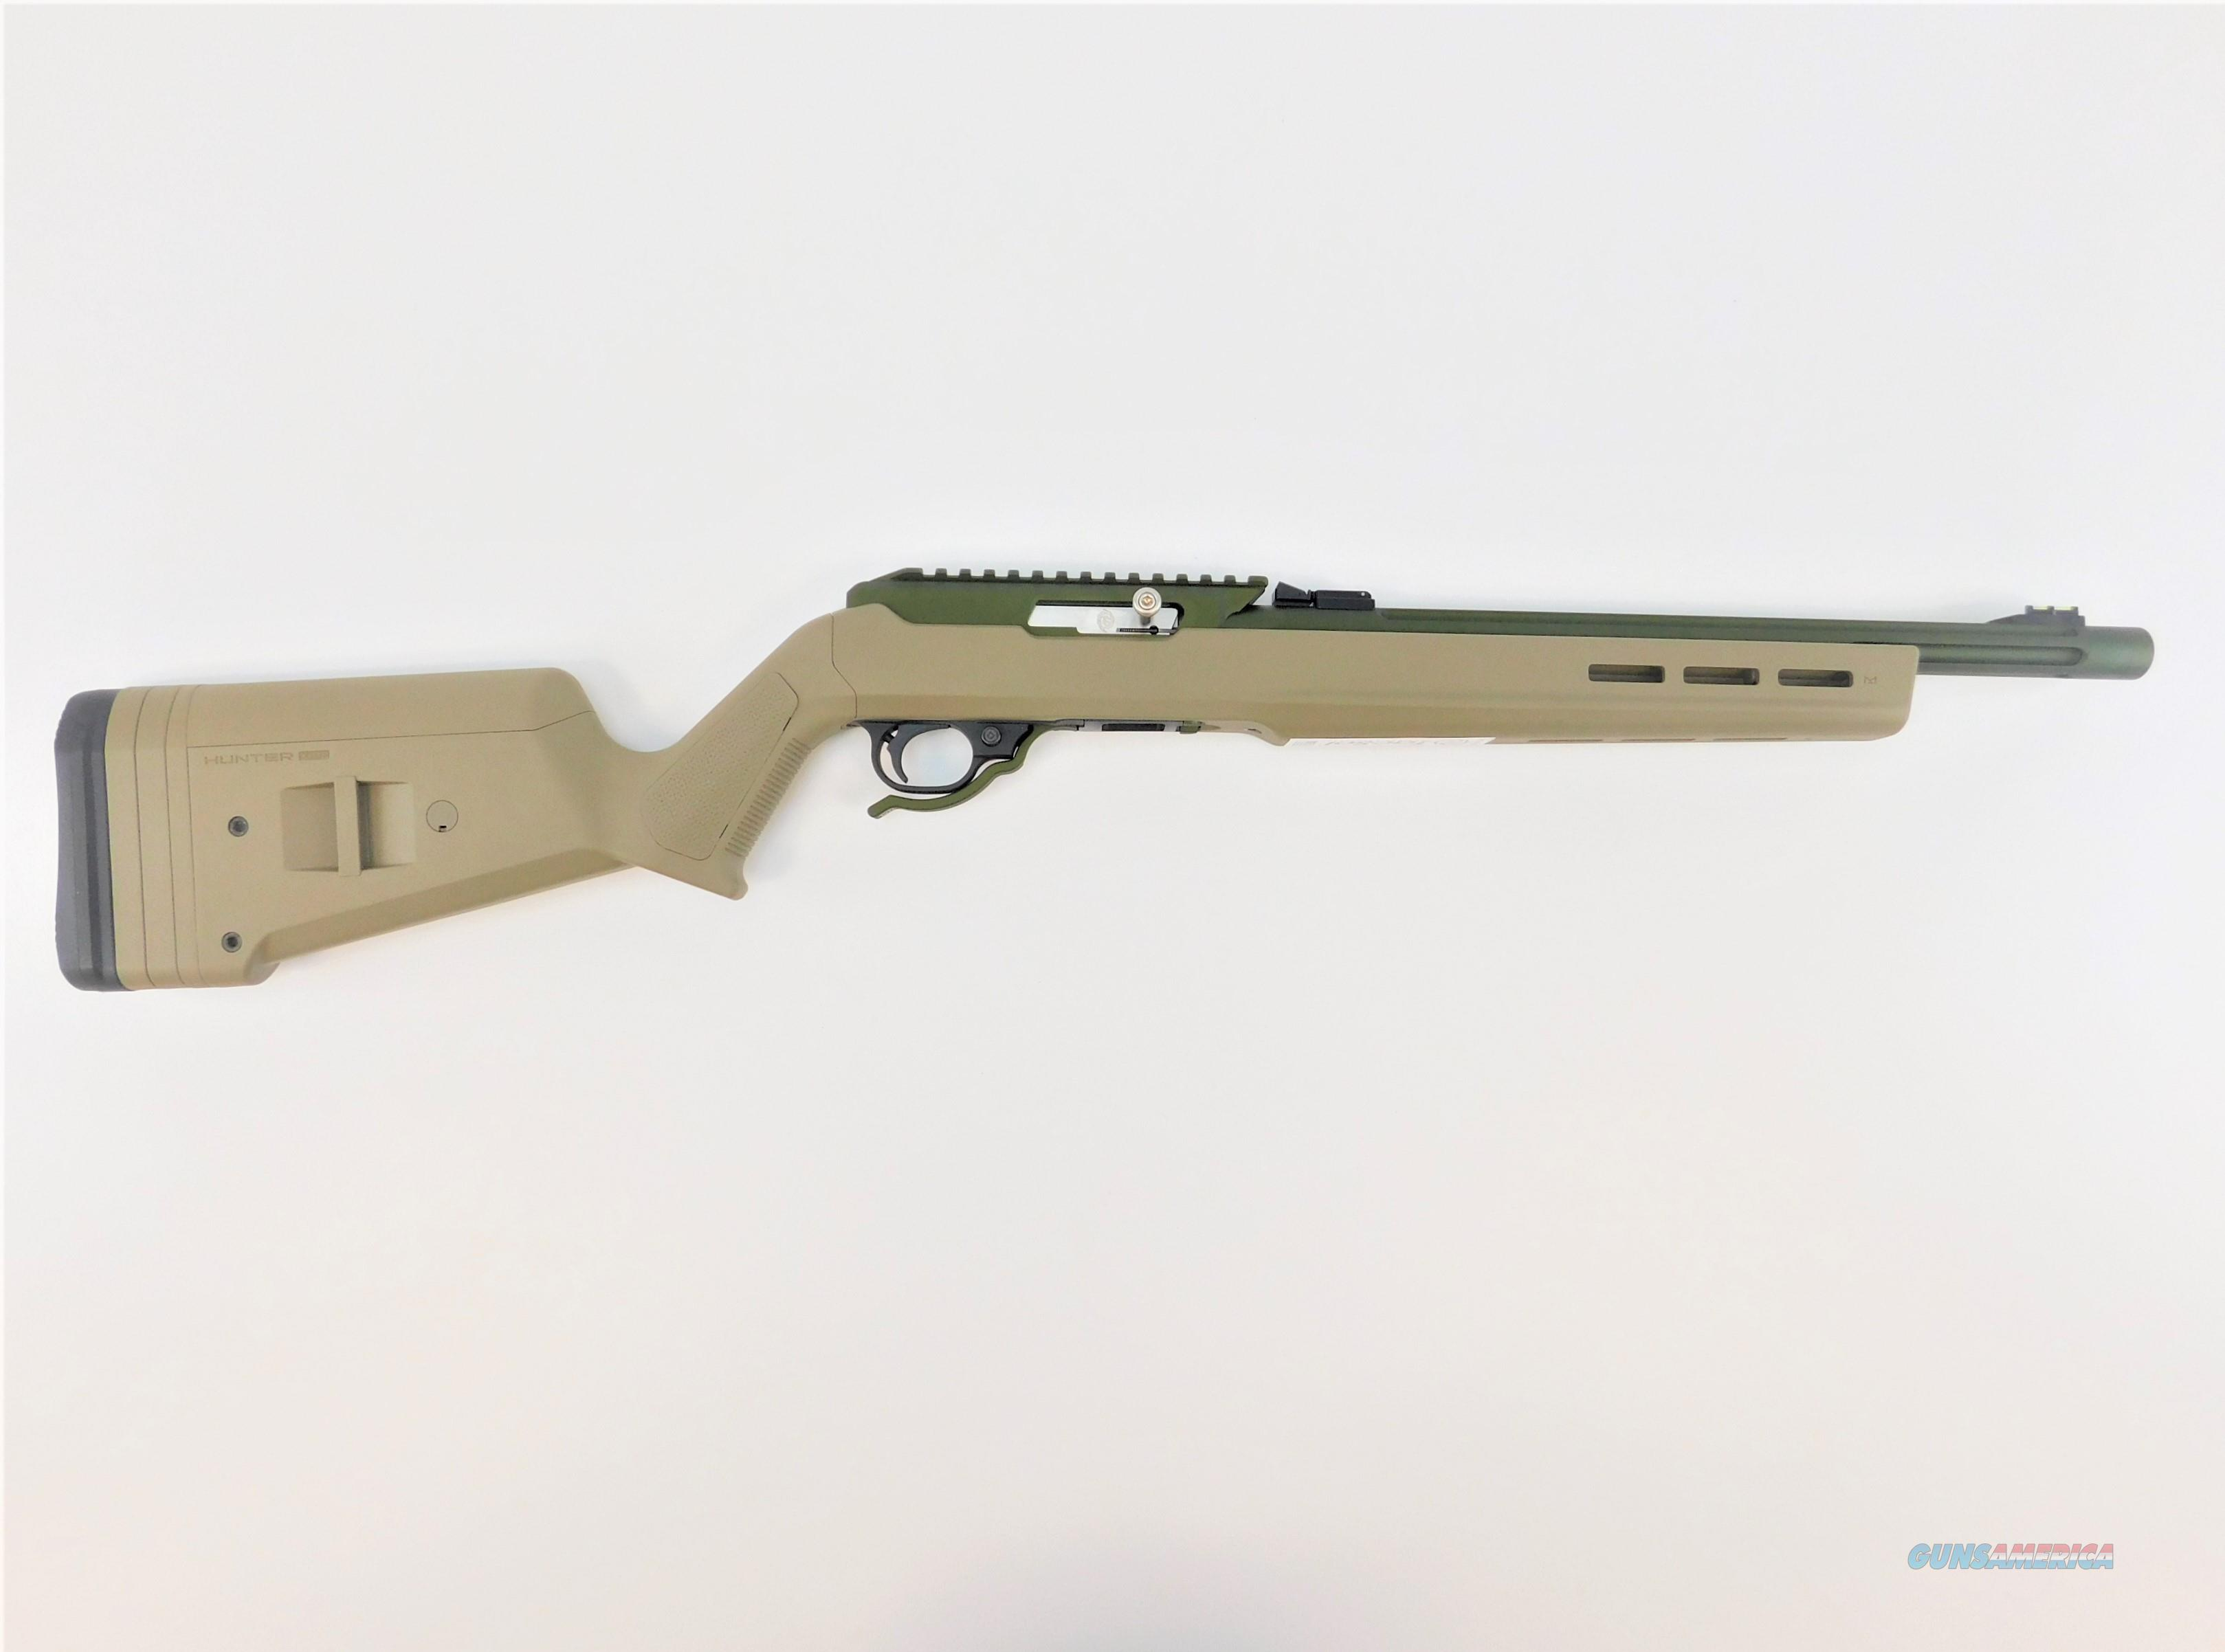 Tactical Solutions X-Ring VR Open Sights .22 LR ODG / FDE Magpul AOS-MOD-B-M-FDE  Guns > Rifles > Ruger Rifles > 10-22